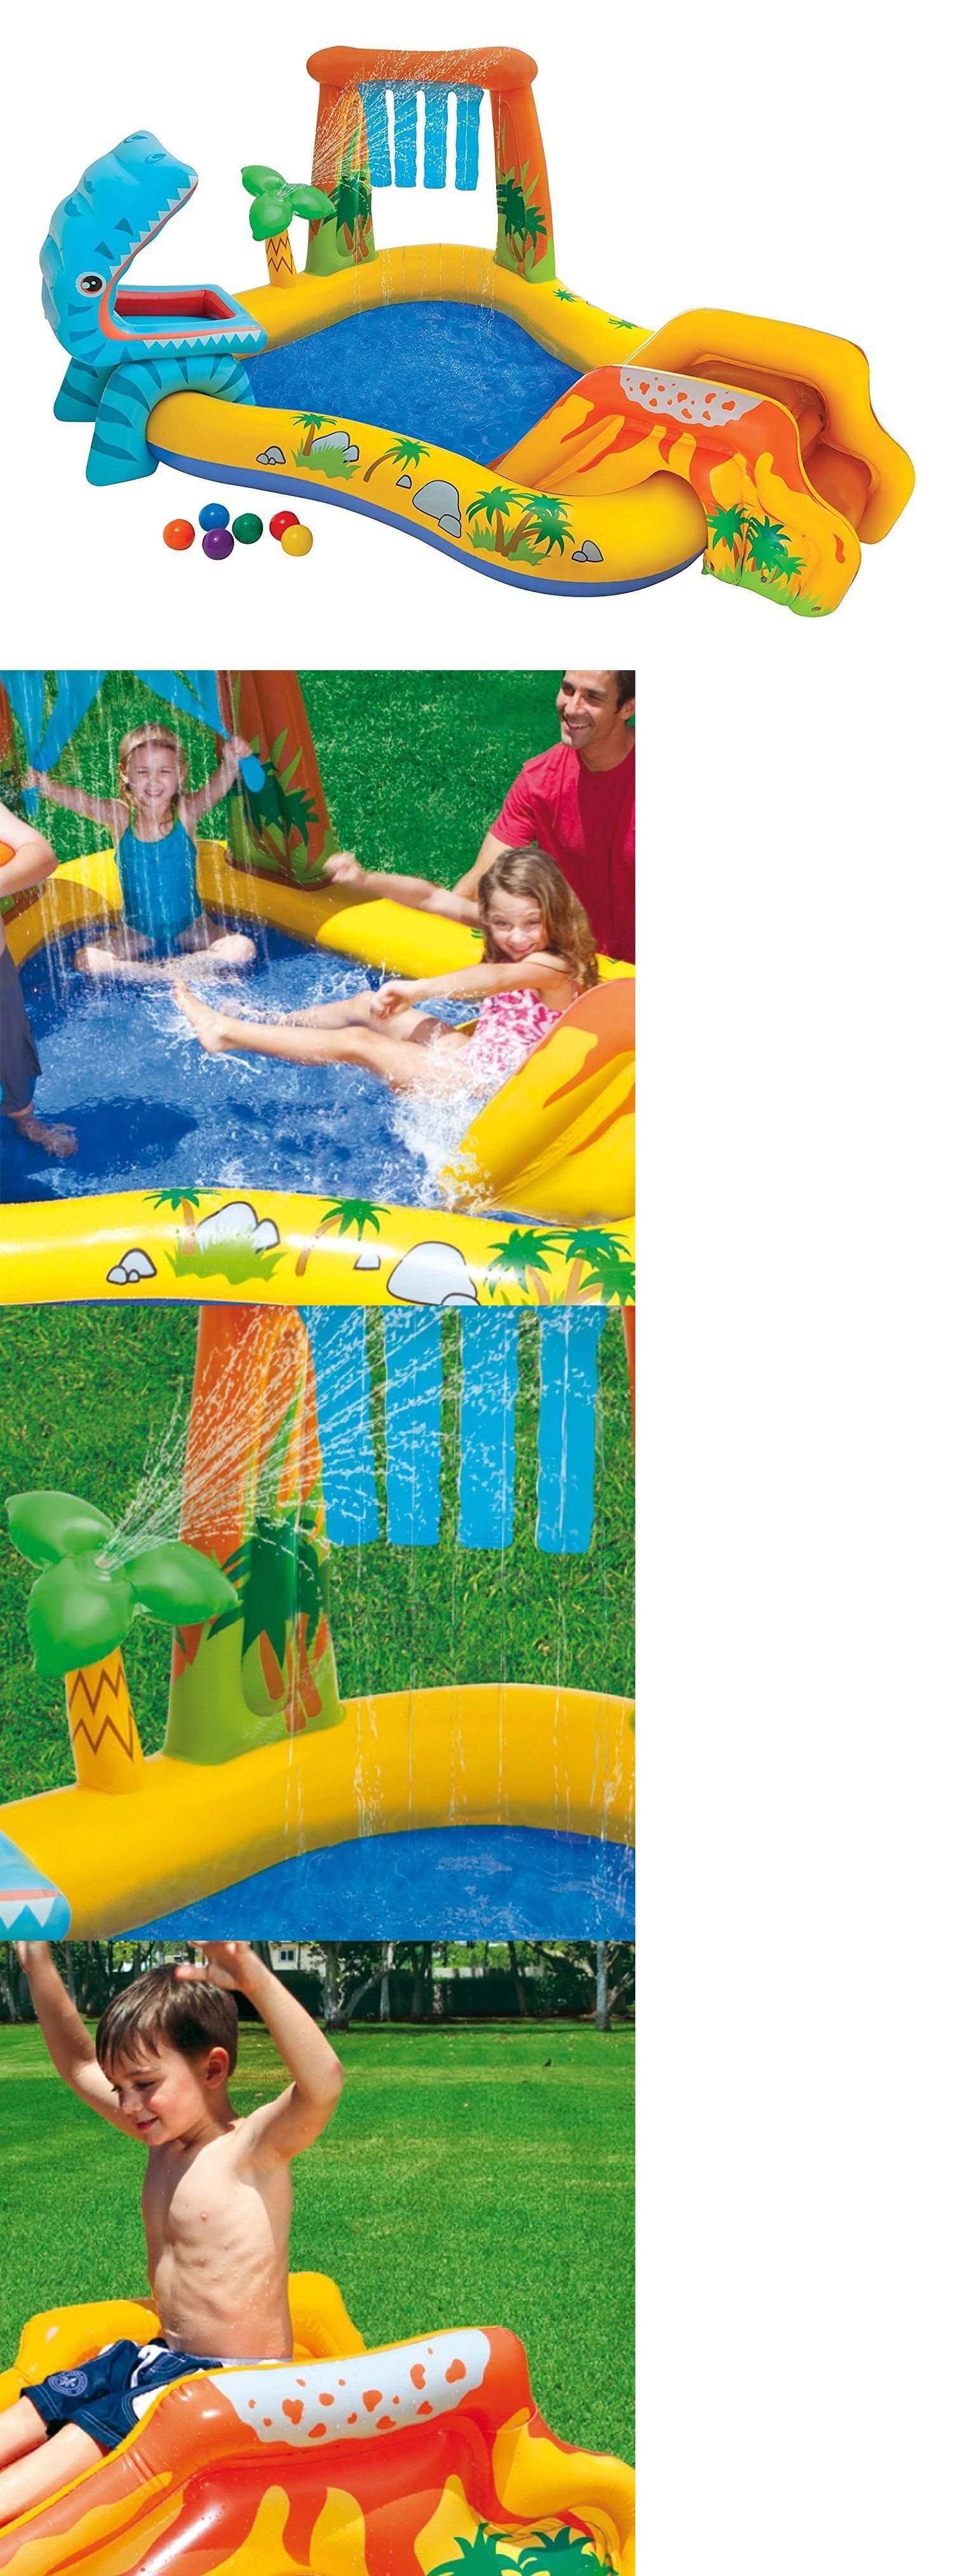 water slides 145992 inflatable water slide park pool play